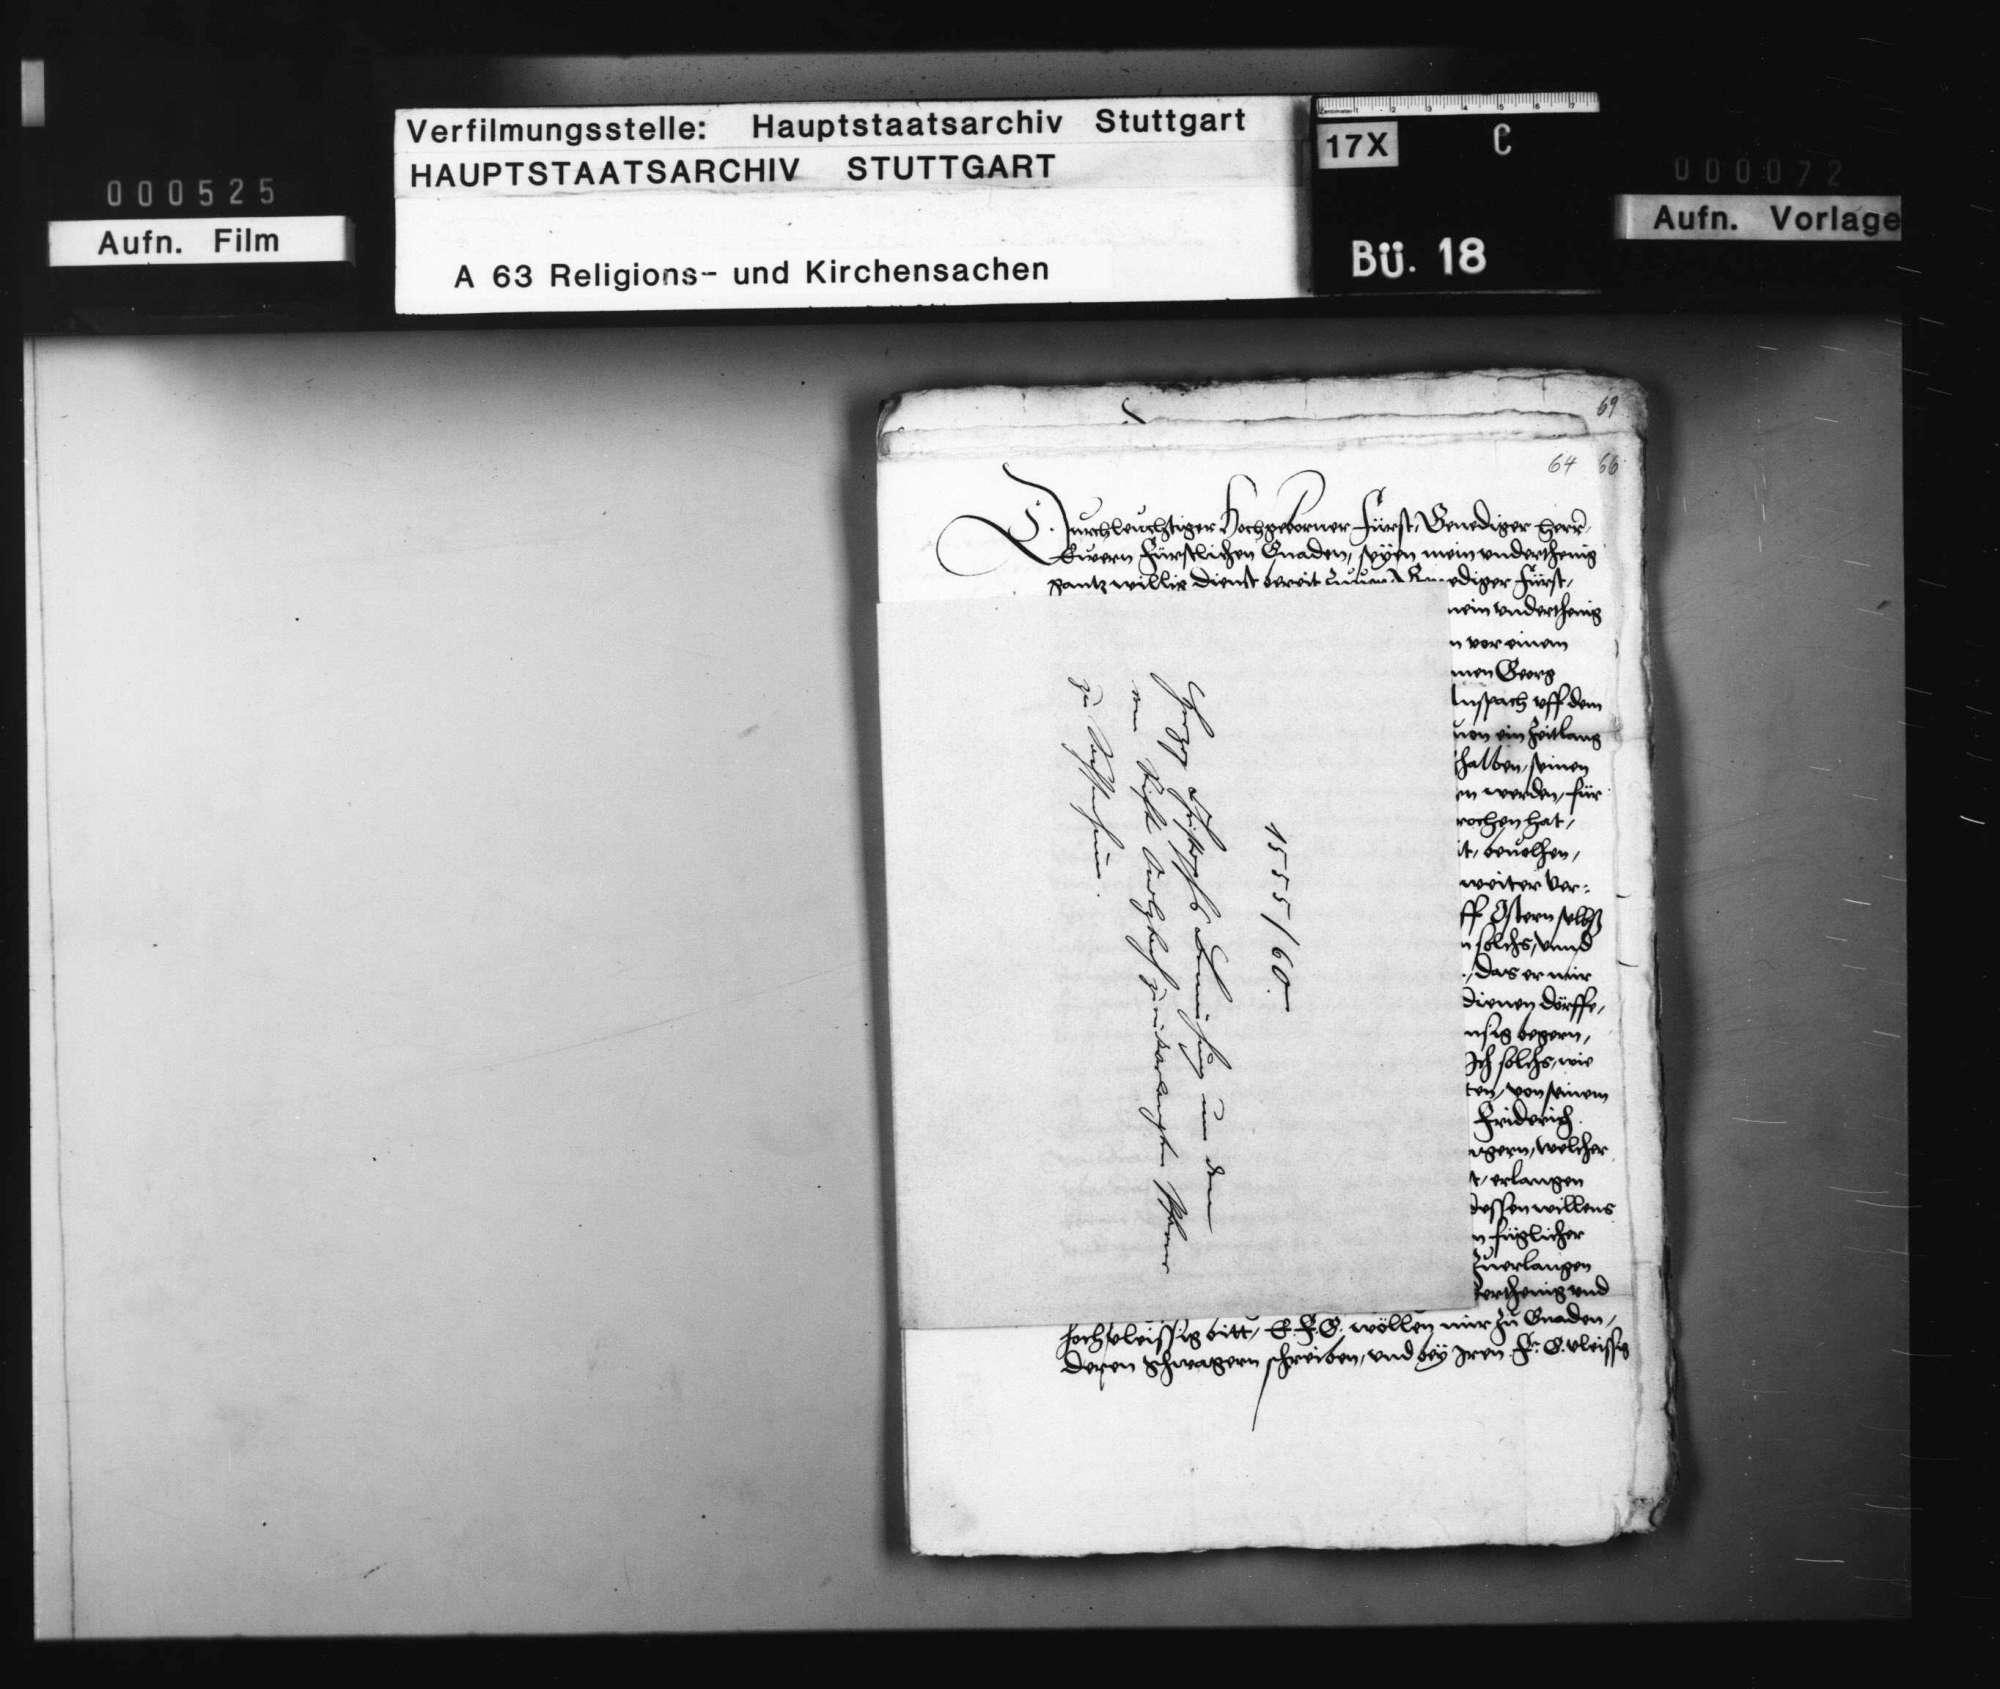 Herzog Christophs Bemühung um den vom Stift Ansbach zurückverlangten Pfarrer zu Sachsenheim., Bild 1